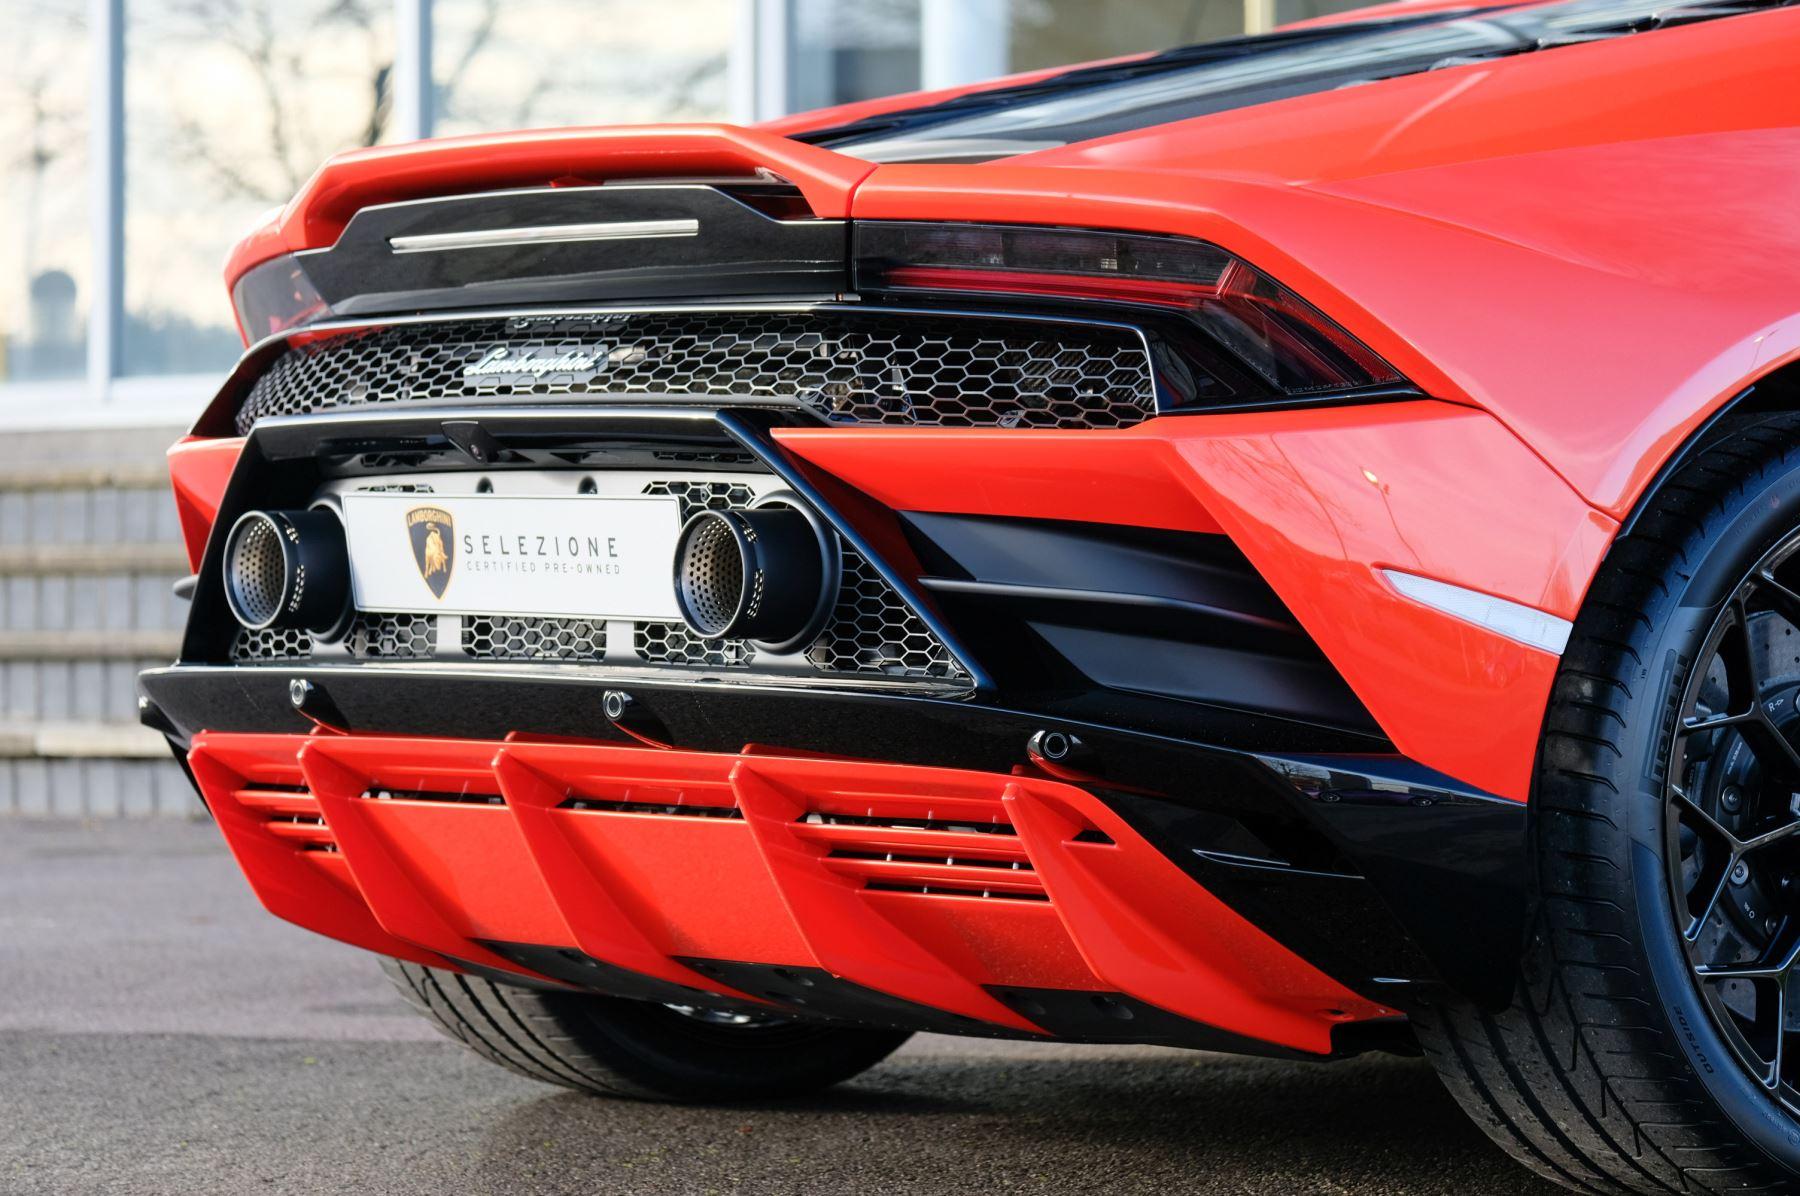 Lamborghini Huracan EVO 5.2 V10 640 2dr Auto AWD image 12